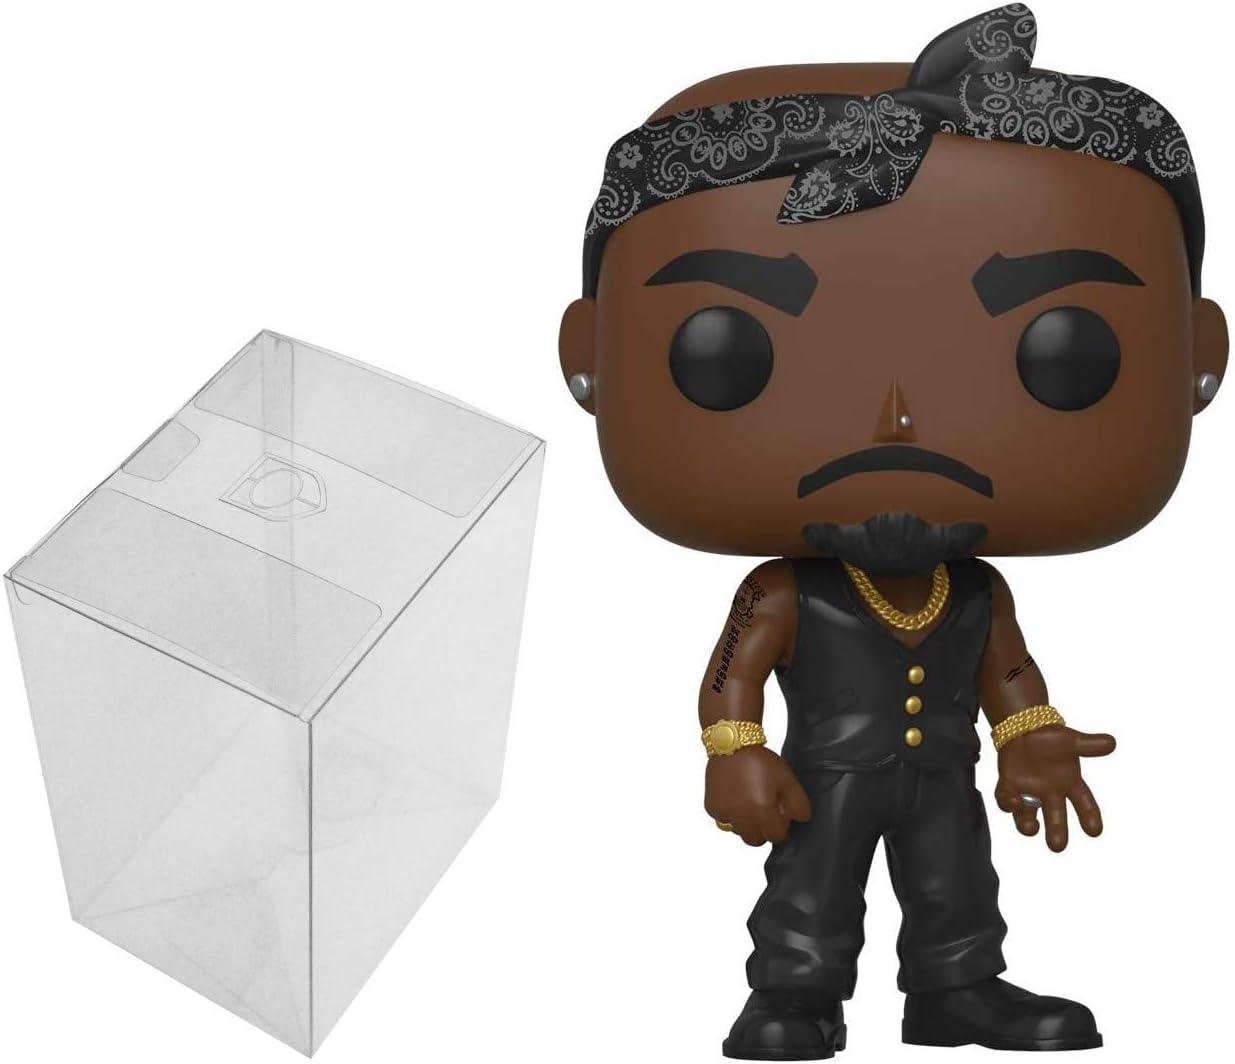 Rocks Funko POP Tupac Shakur Tupac in Vest with Bandana Bundle with 1 PopShield Pop Box Protector